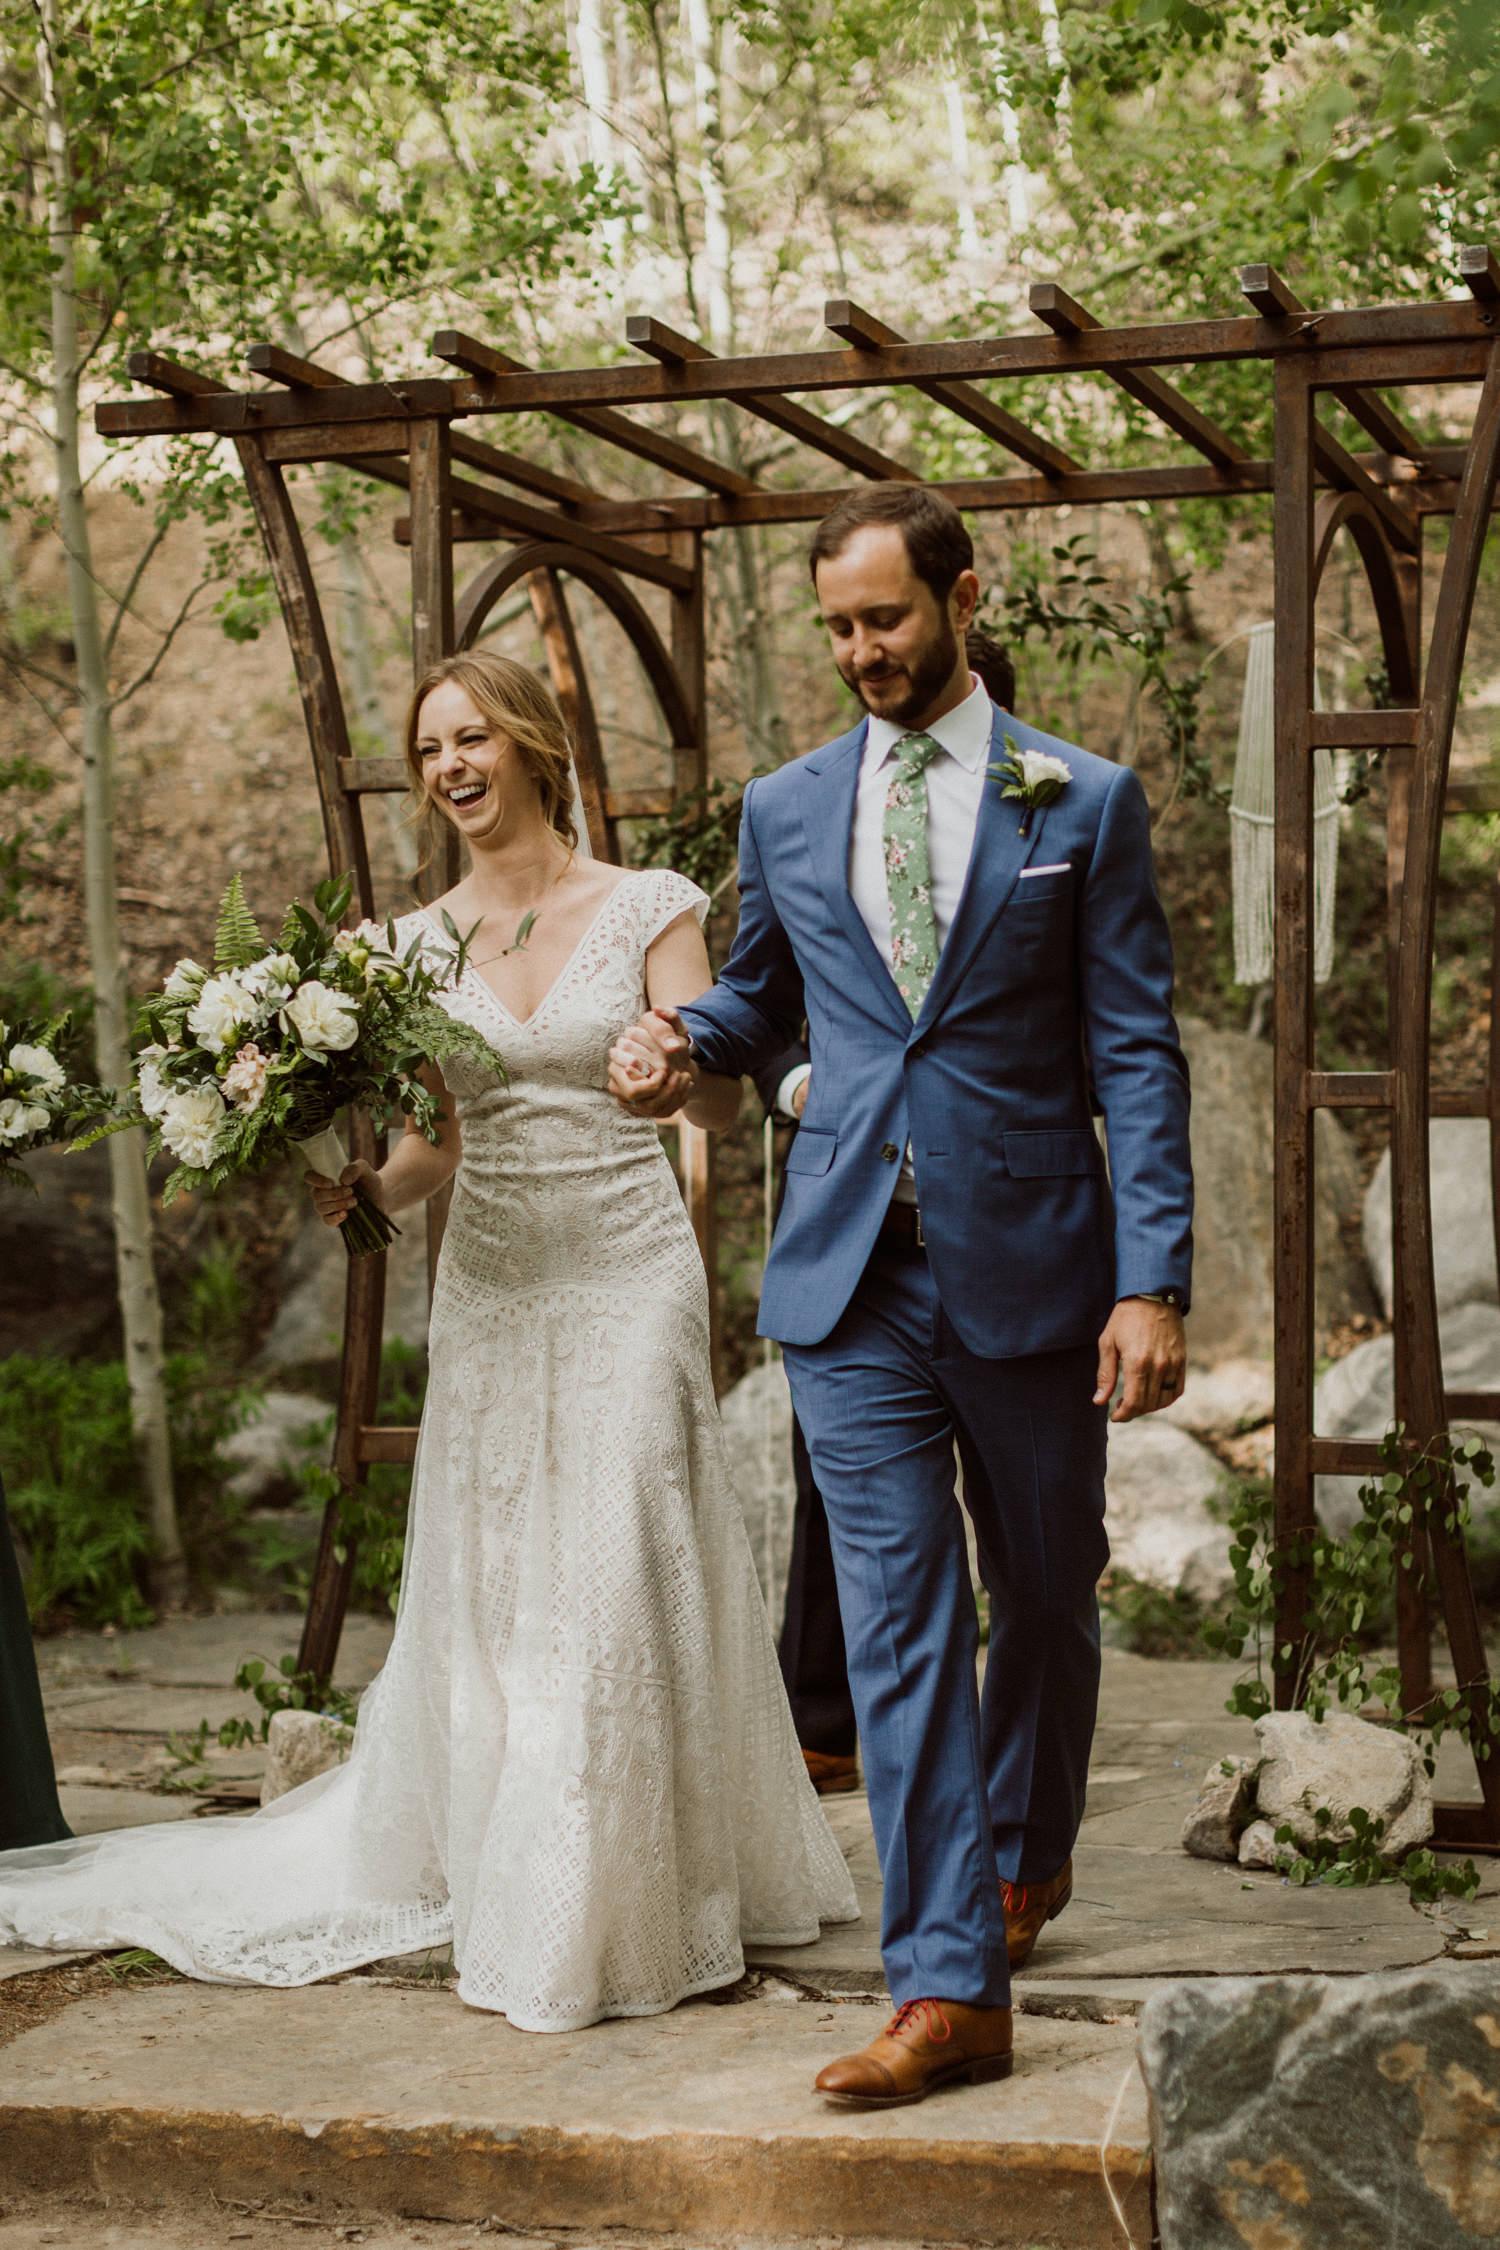 bohemian-backyard-wedding-breckenridge-colorado-88.jpg